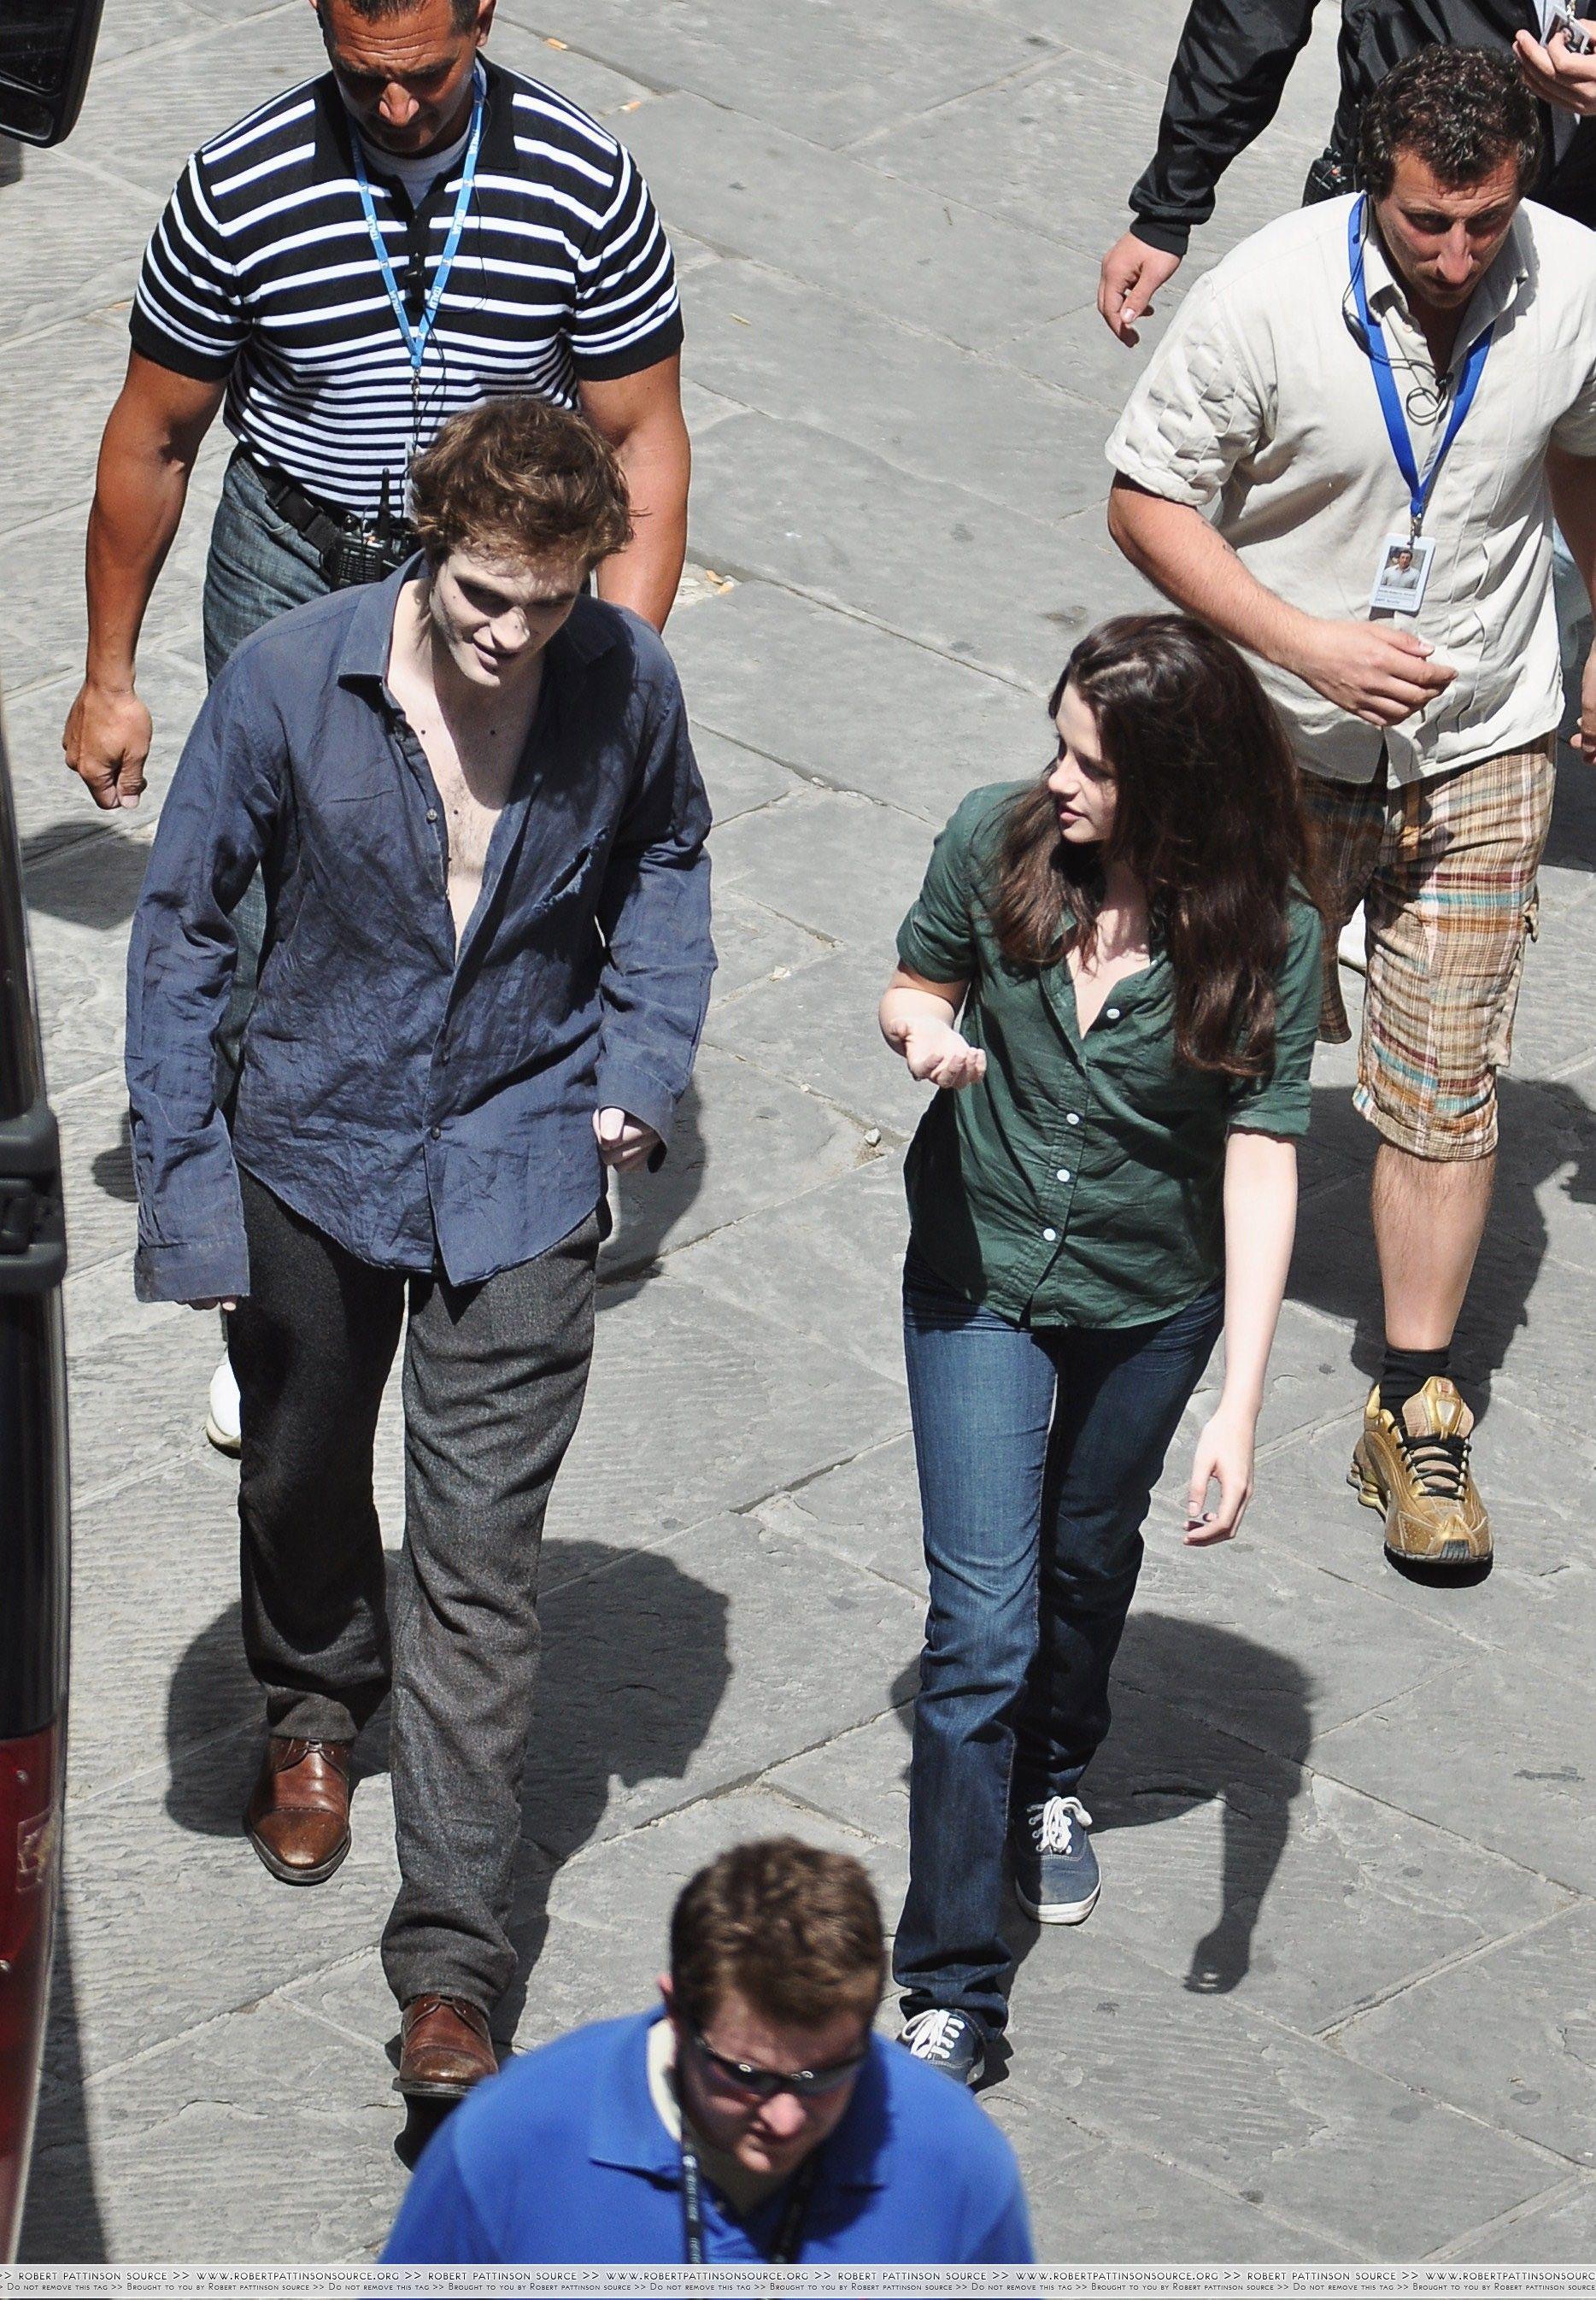 Pin By Schlager G On Rob Pattinson Kristen Stewart Making Movies Twilight New Moon Twilight Series Movies Twilight Saga